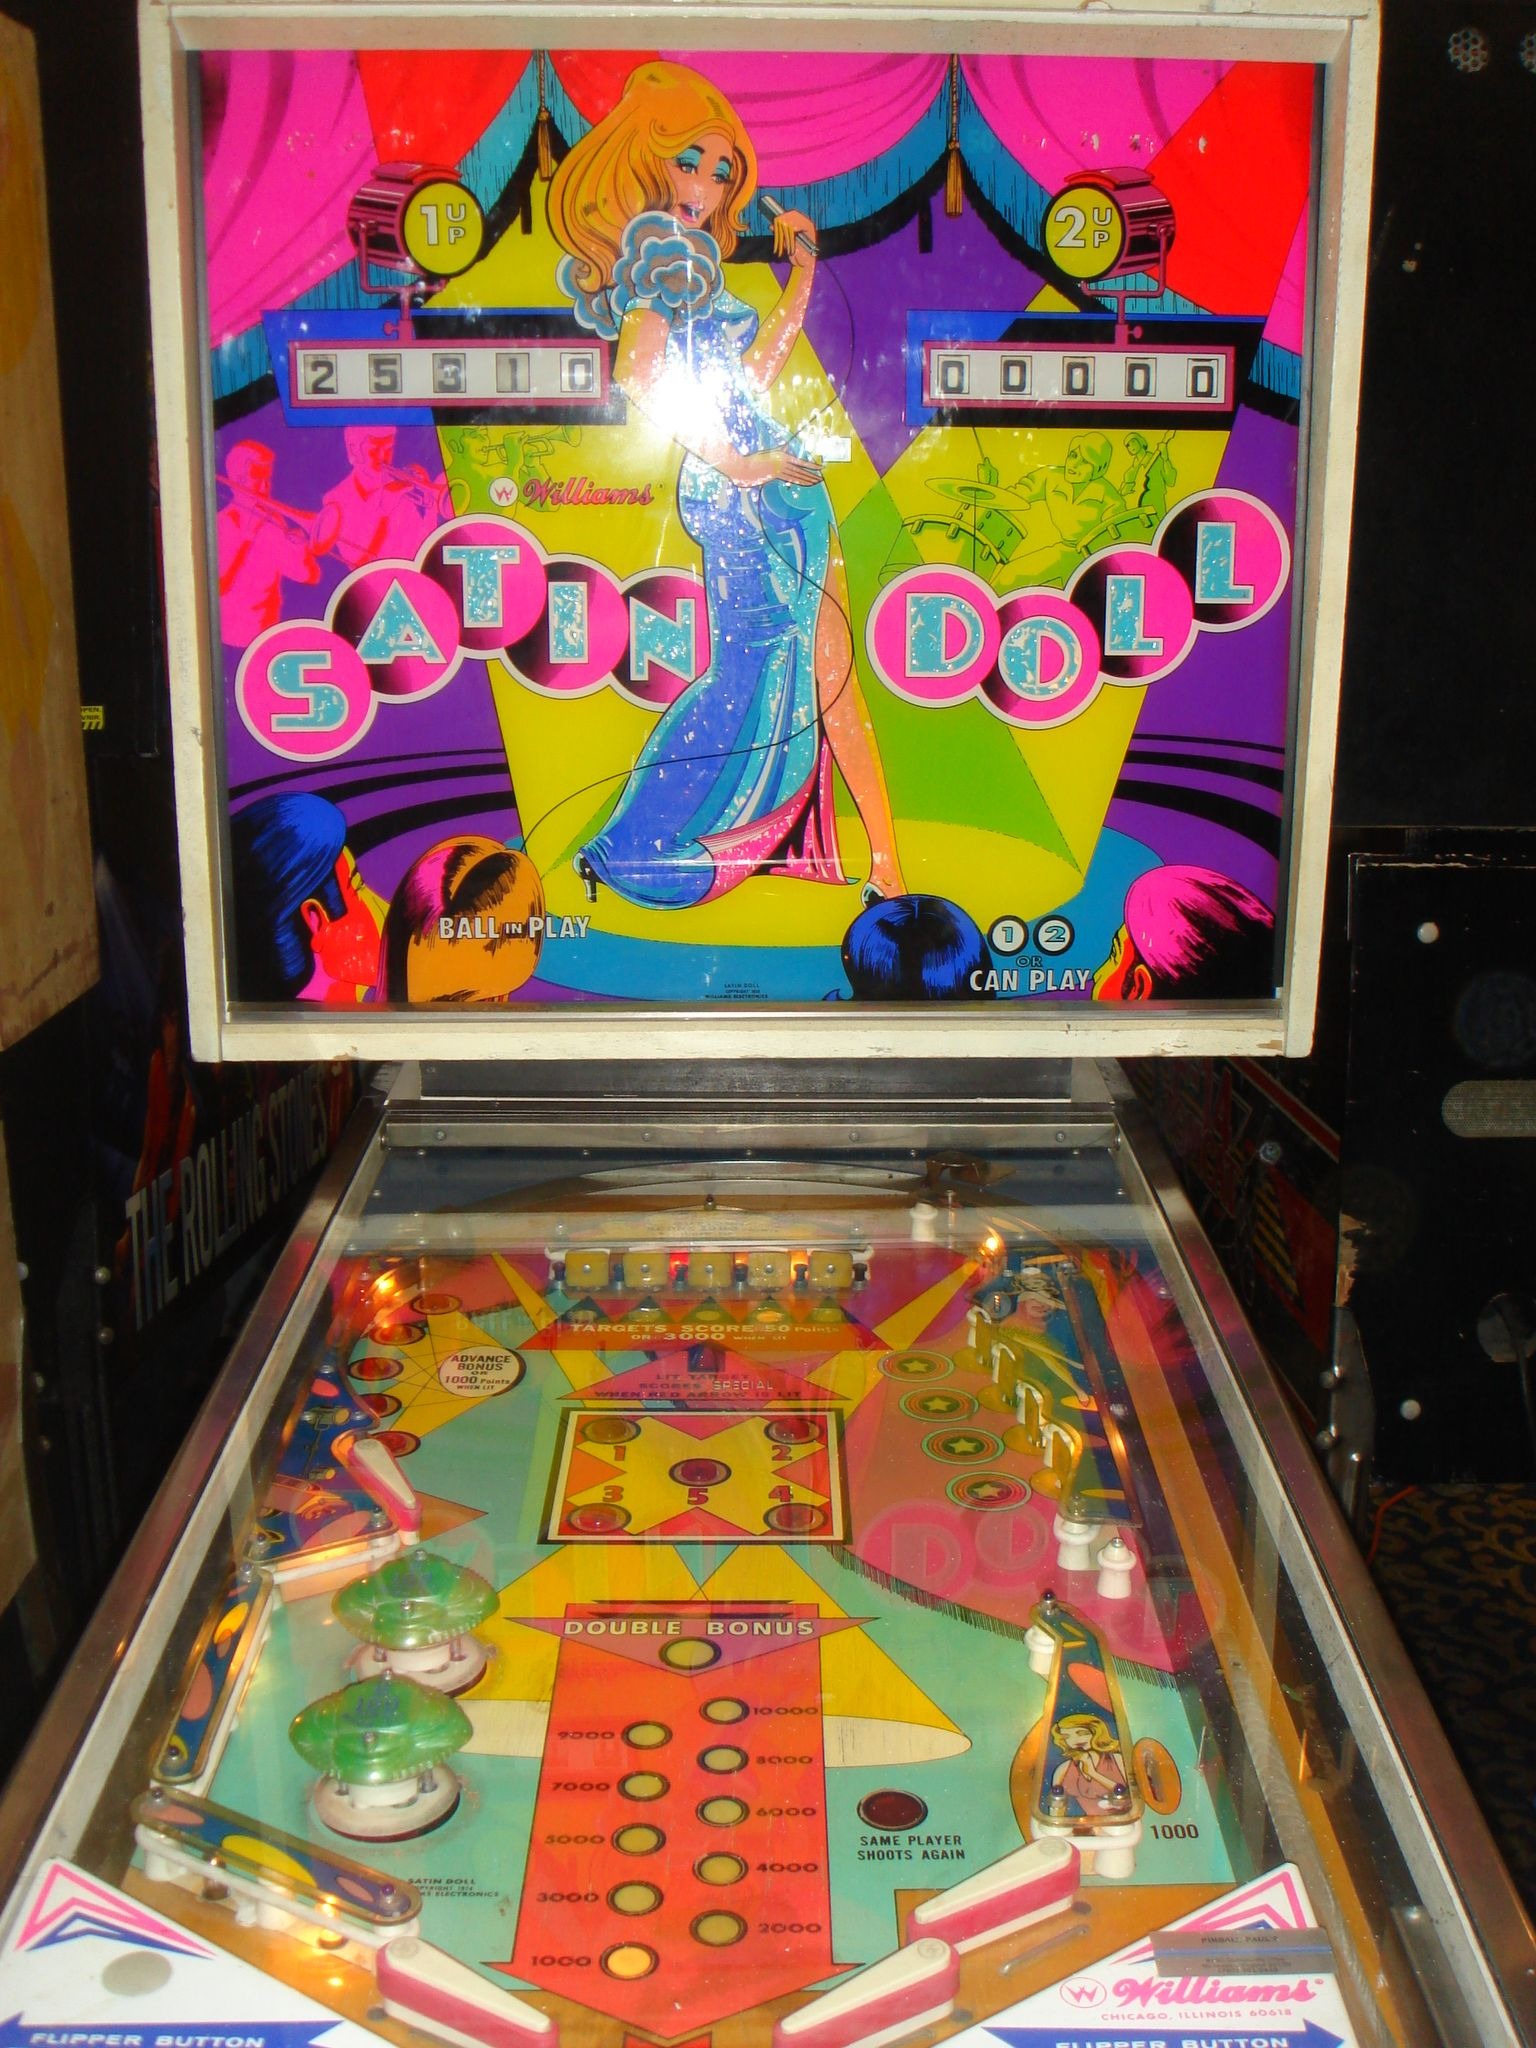 1975 Satin Doll Williams Pinball Machine Pinball Pinball Machines Pinball Machine